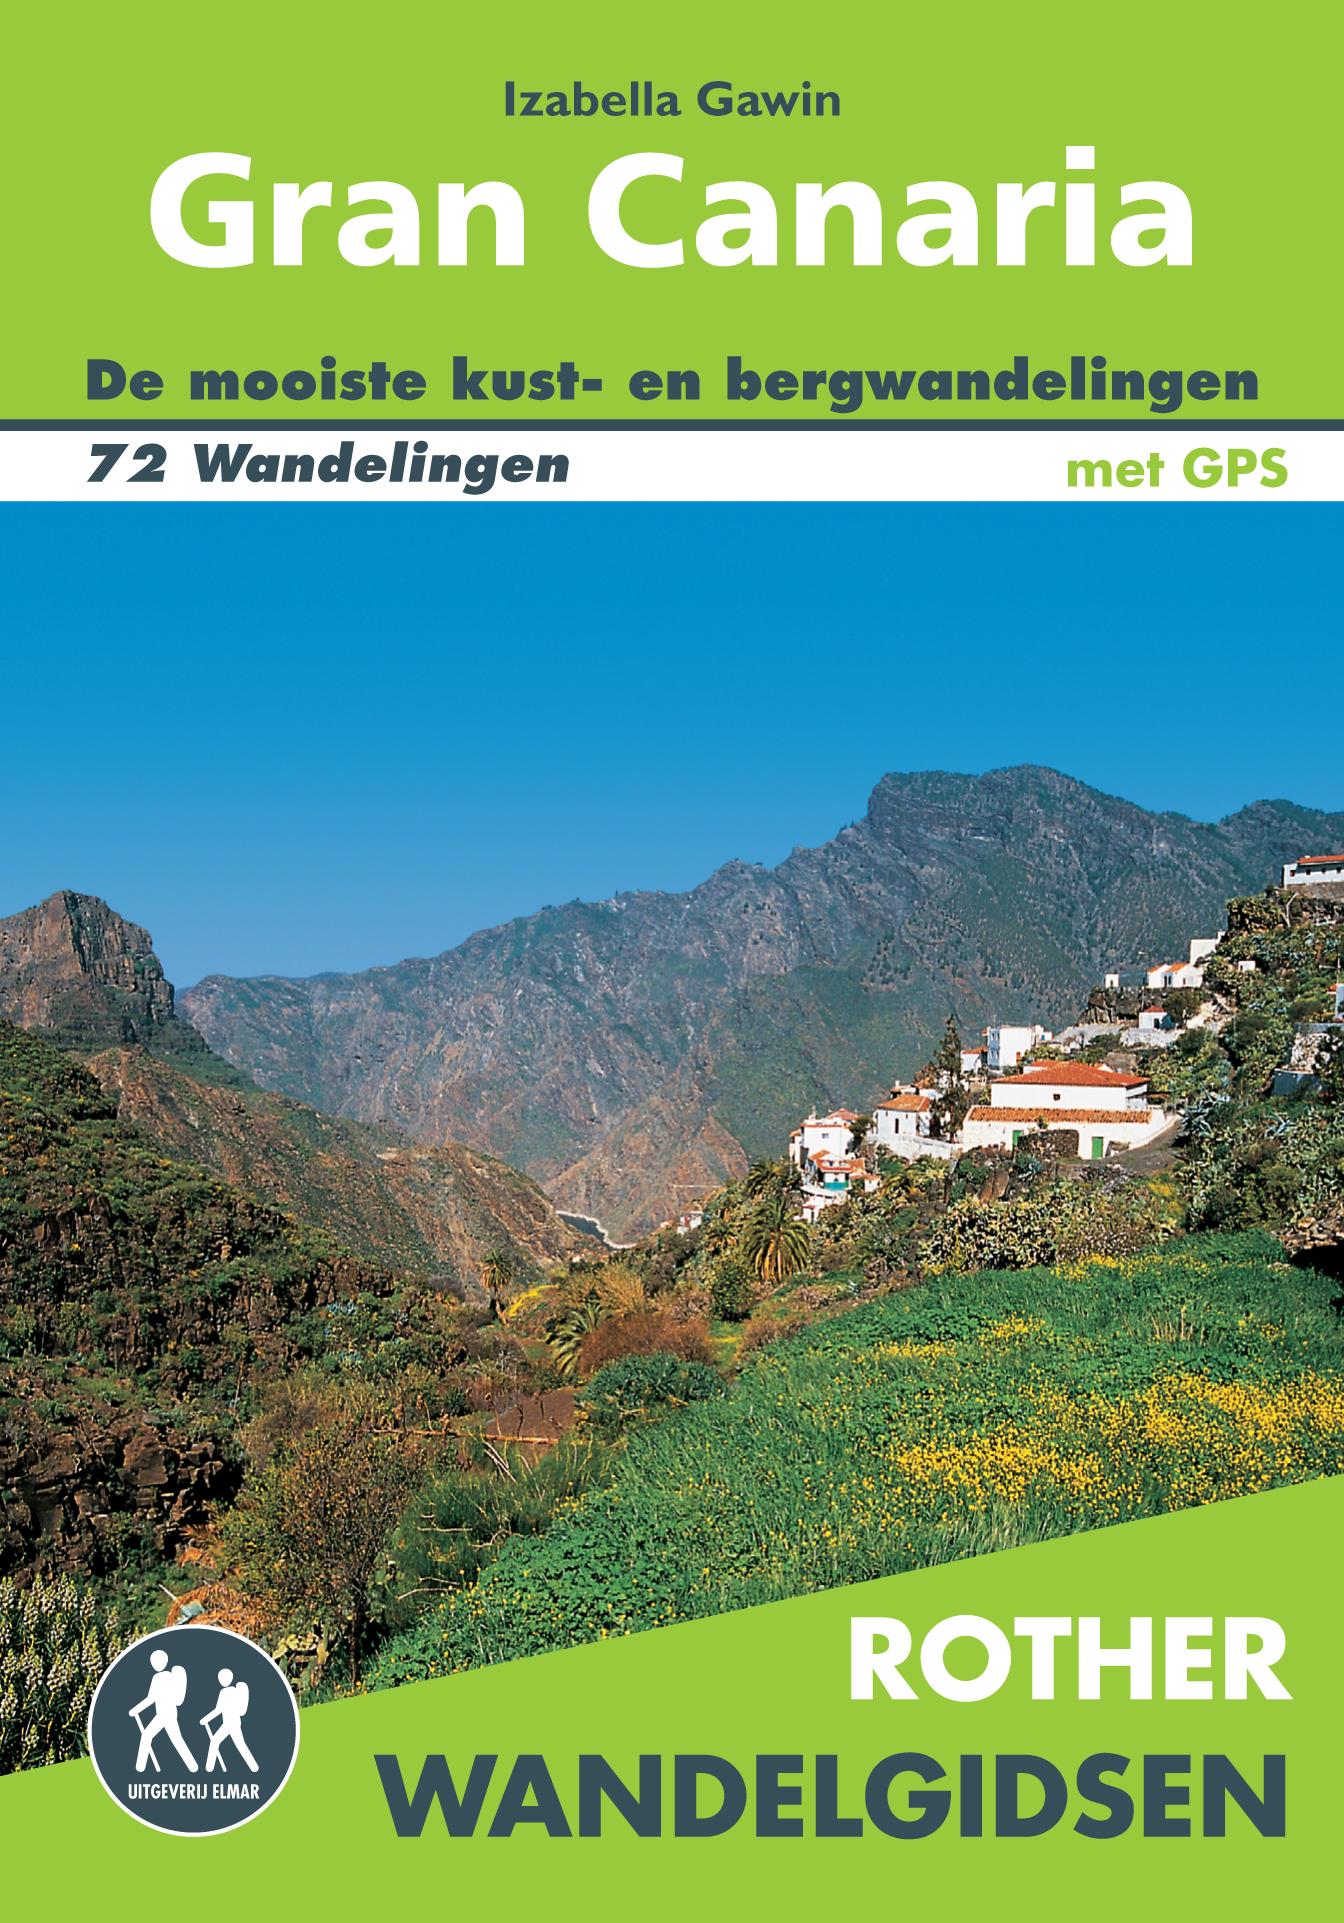 Wandelgids Gran Canaria (Nederlands)   Elmar - Rother   Izabella Gawin